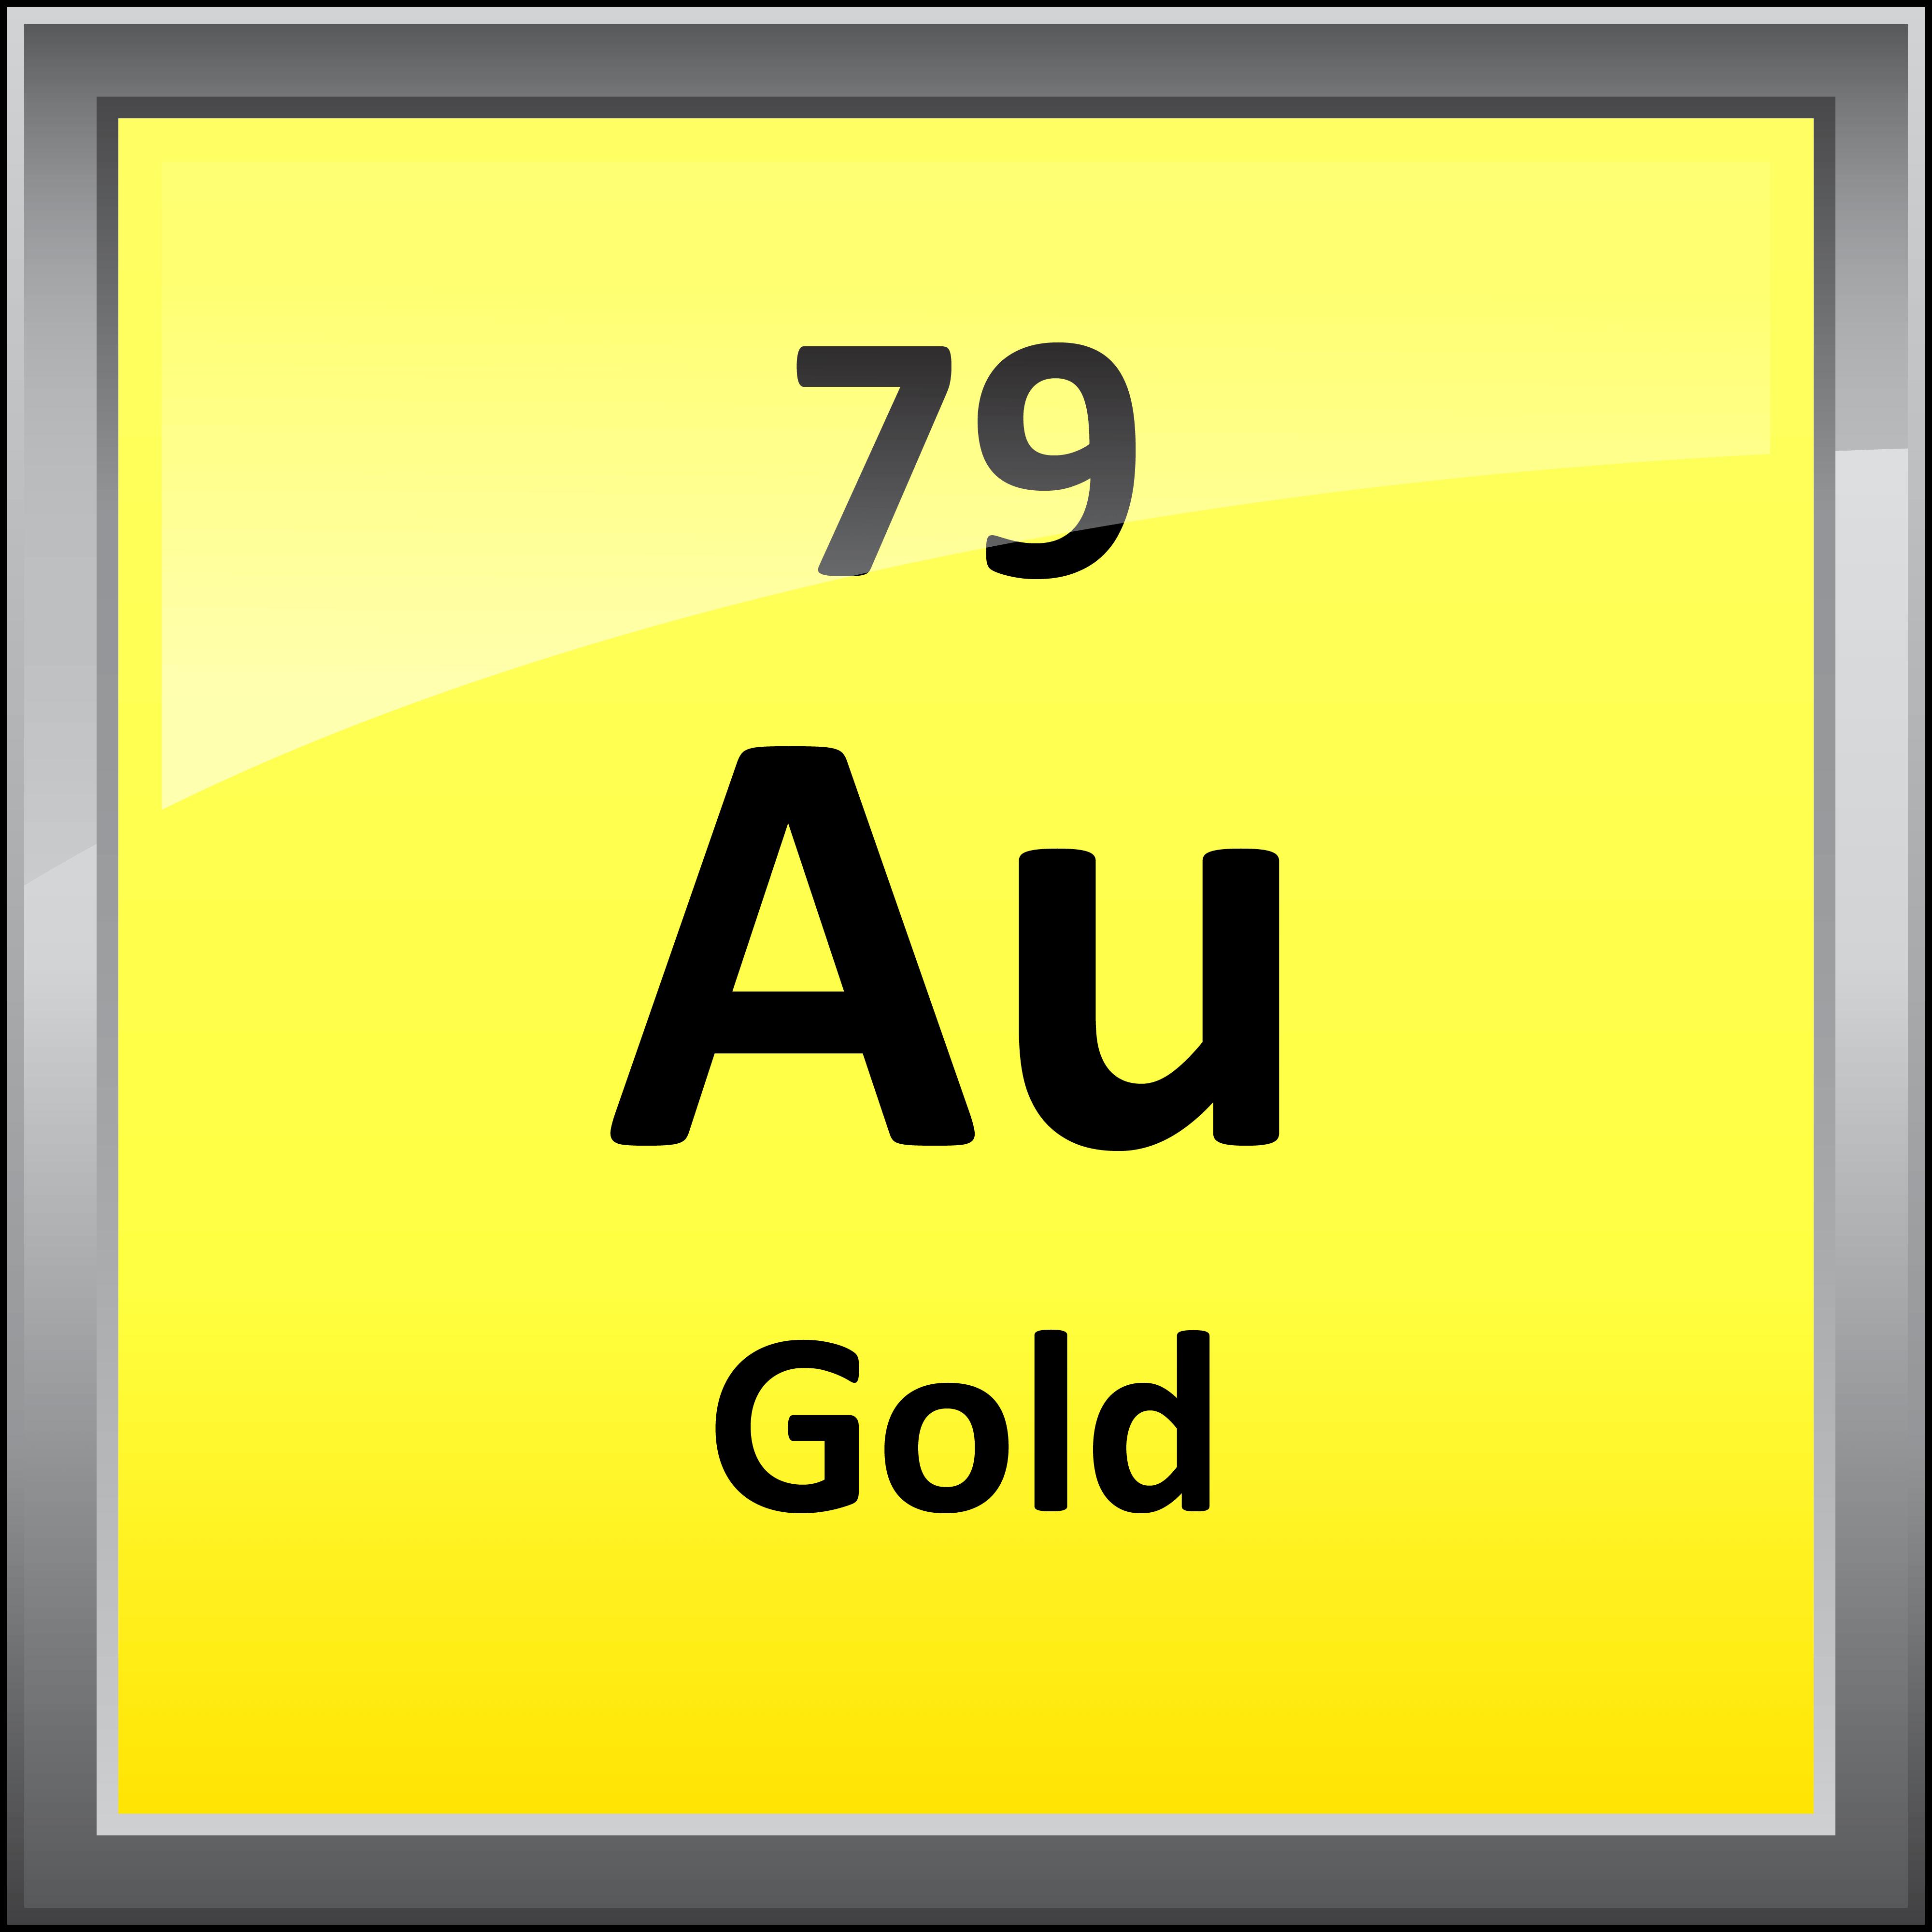 Printable periodic table element symbols 079 gold gamestrikefo Gallery